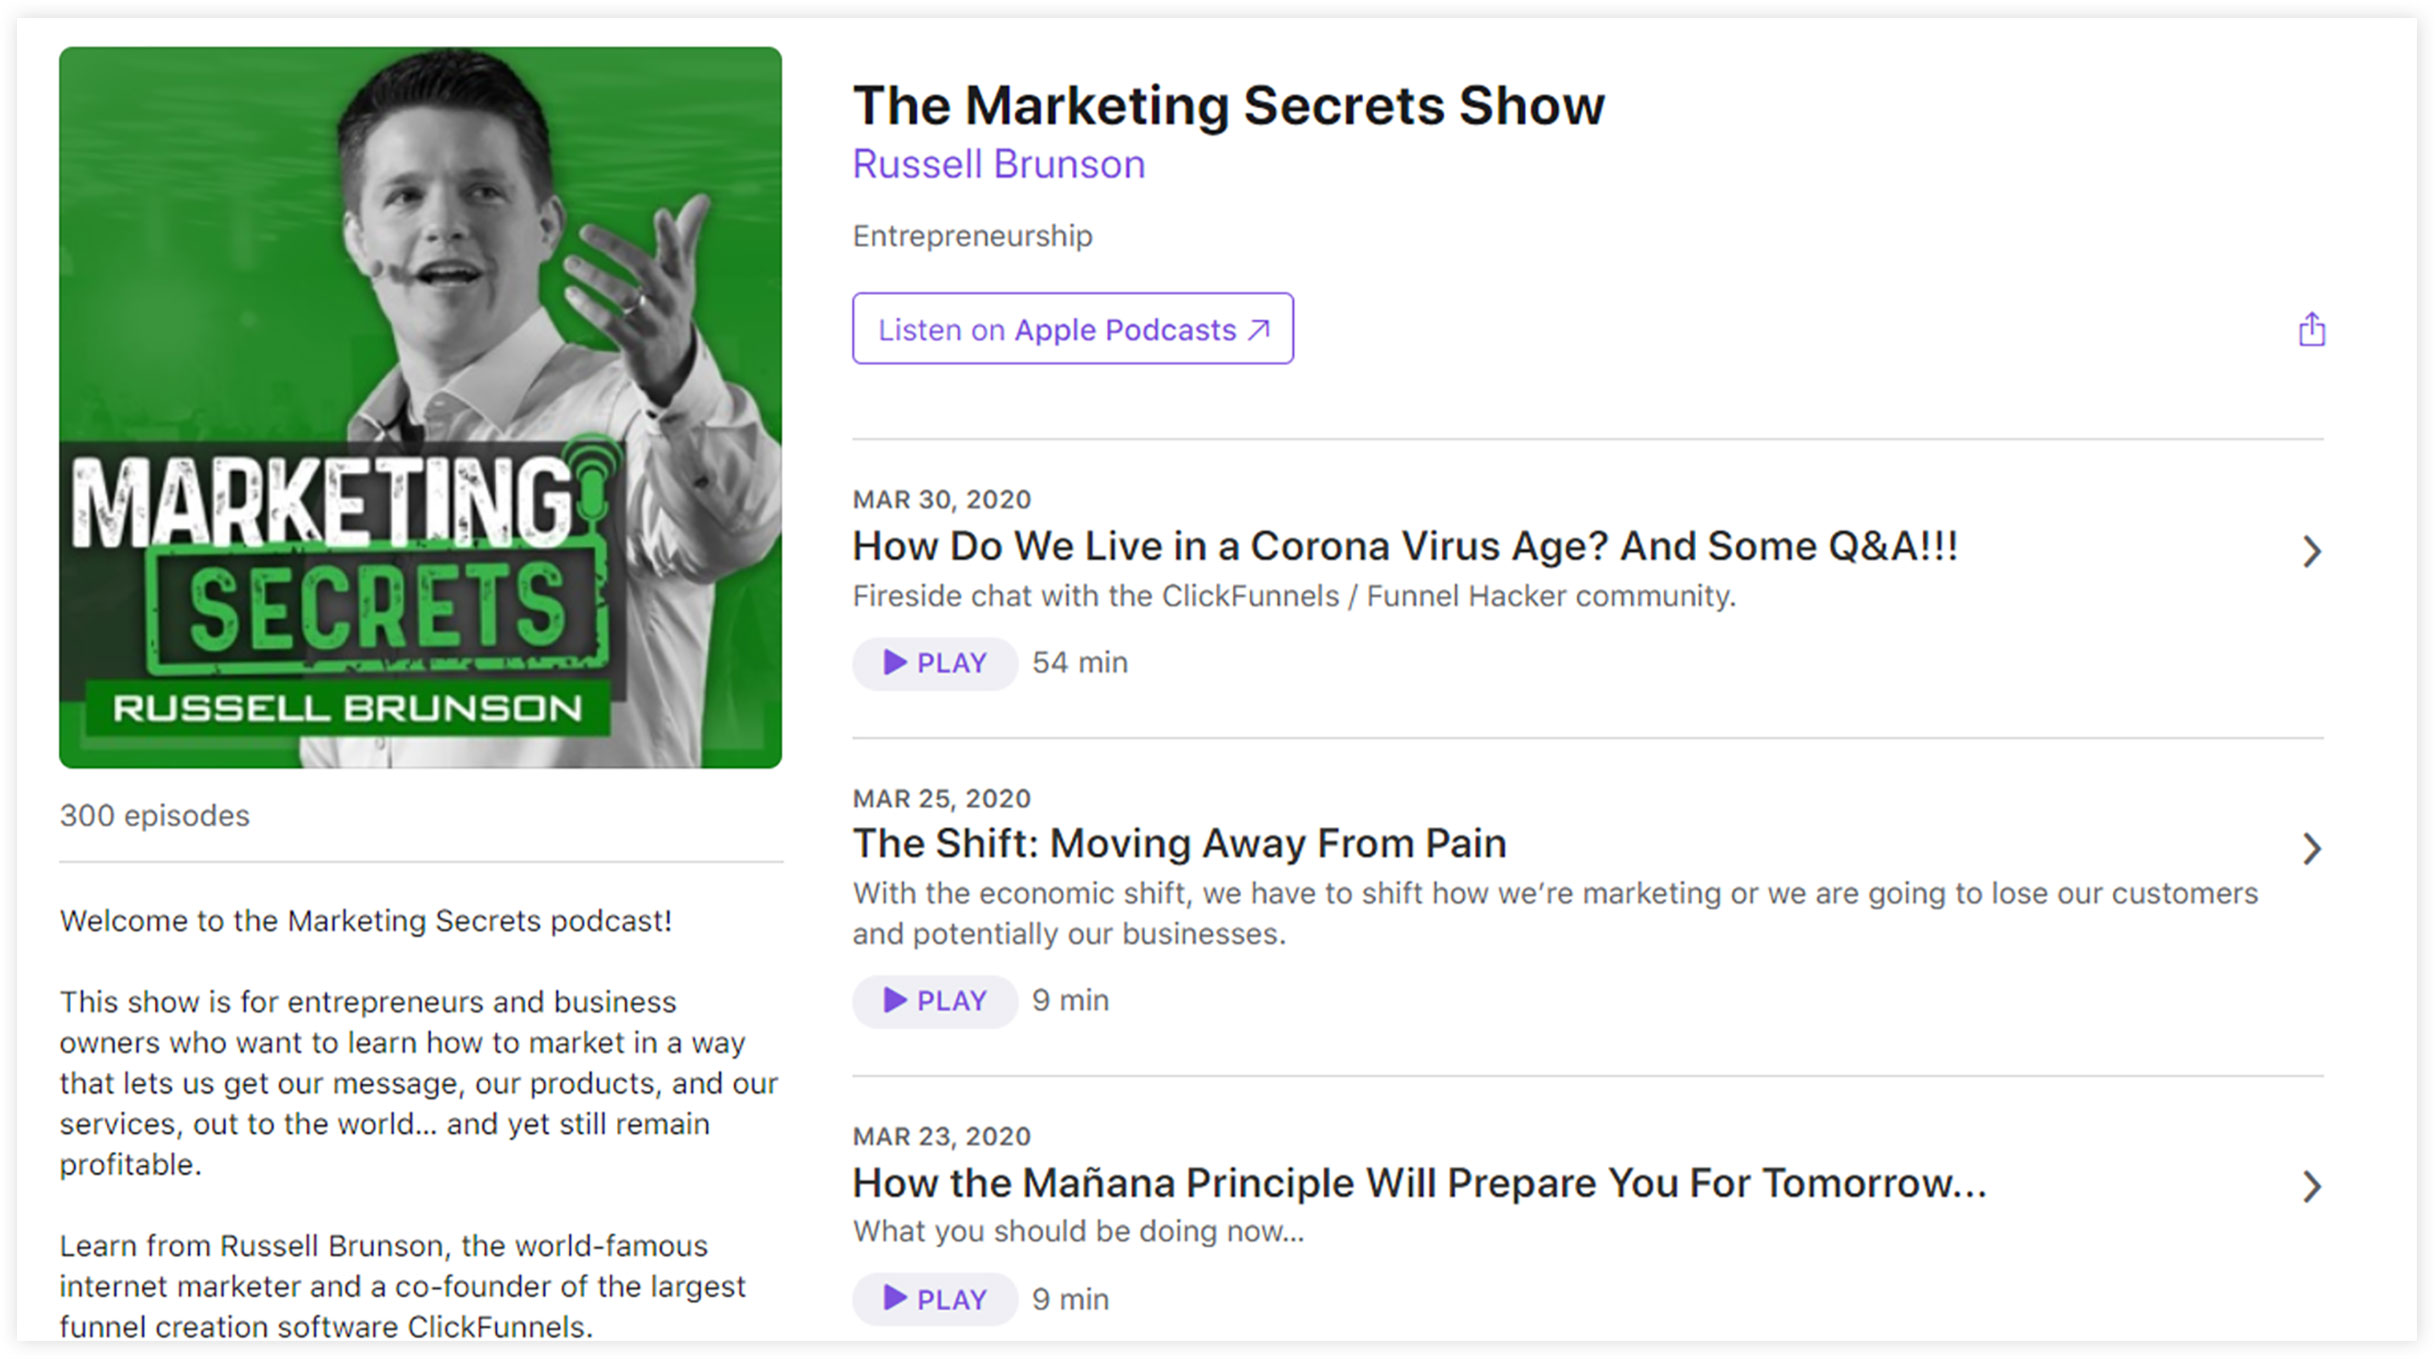 Marketing Secrets Podcast by Russel Brunson